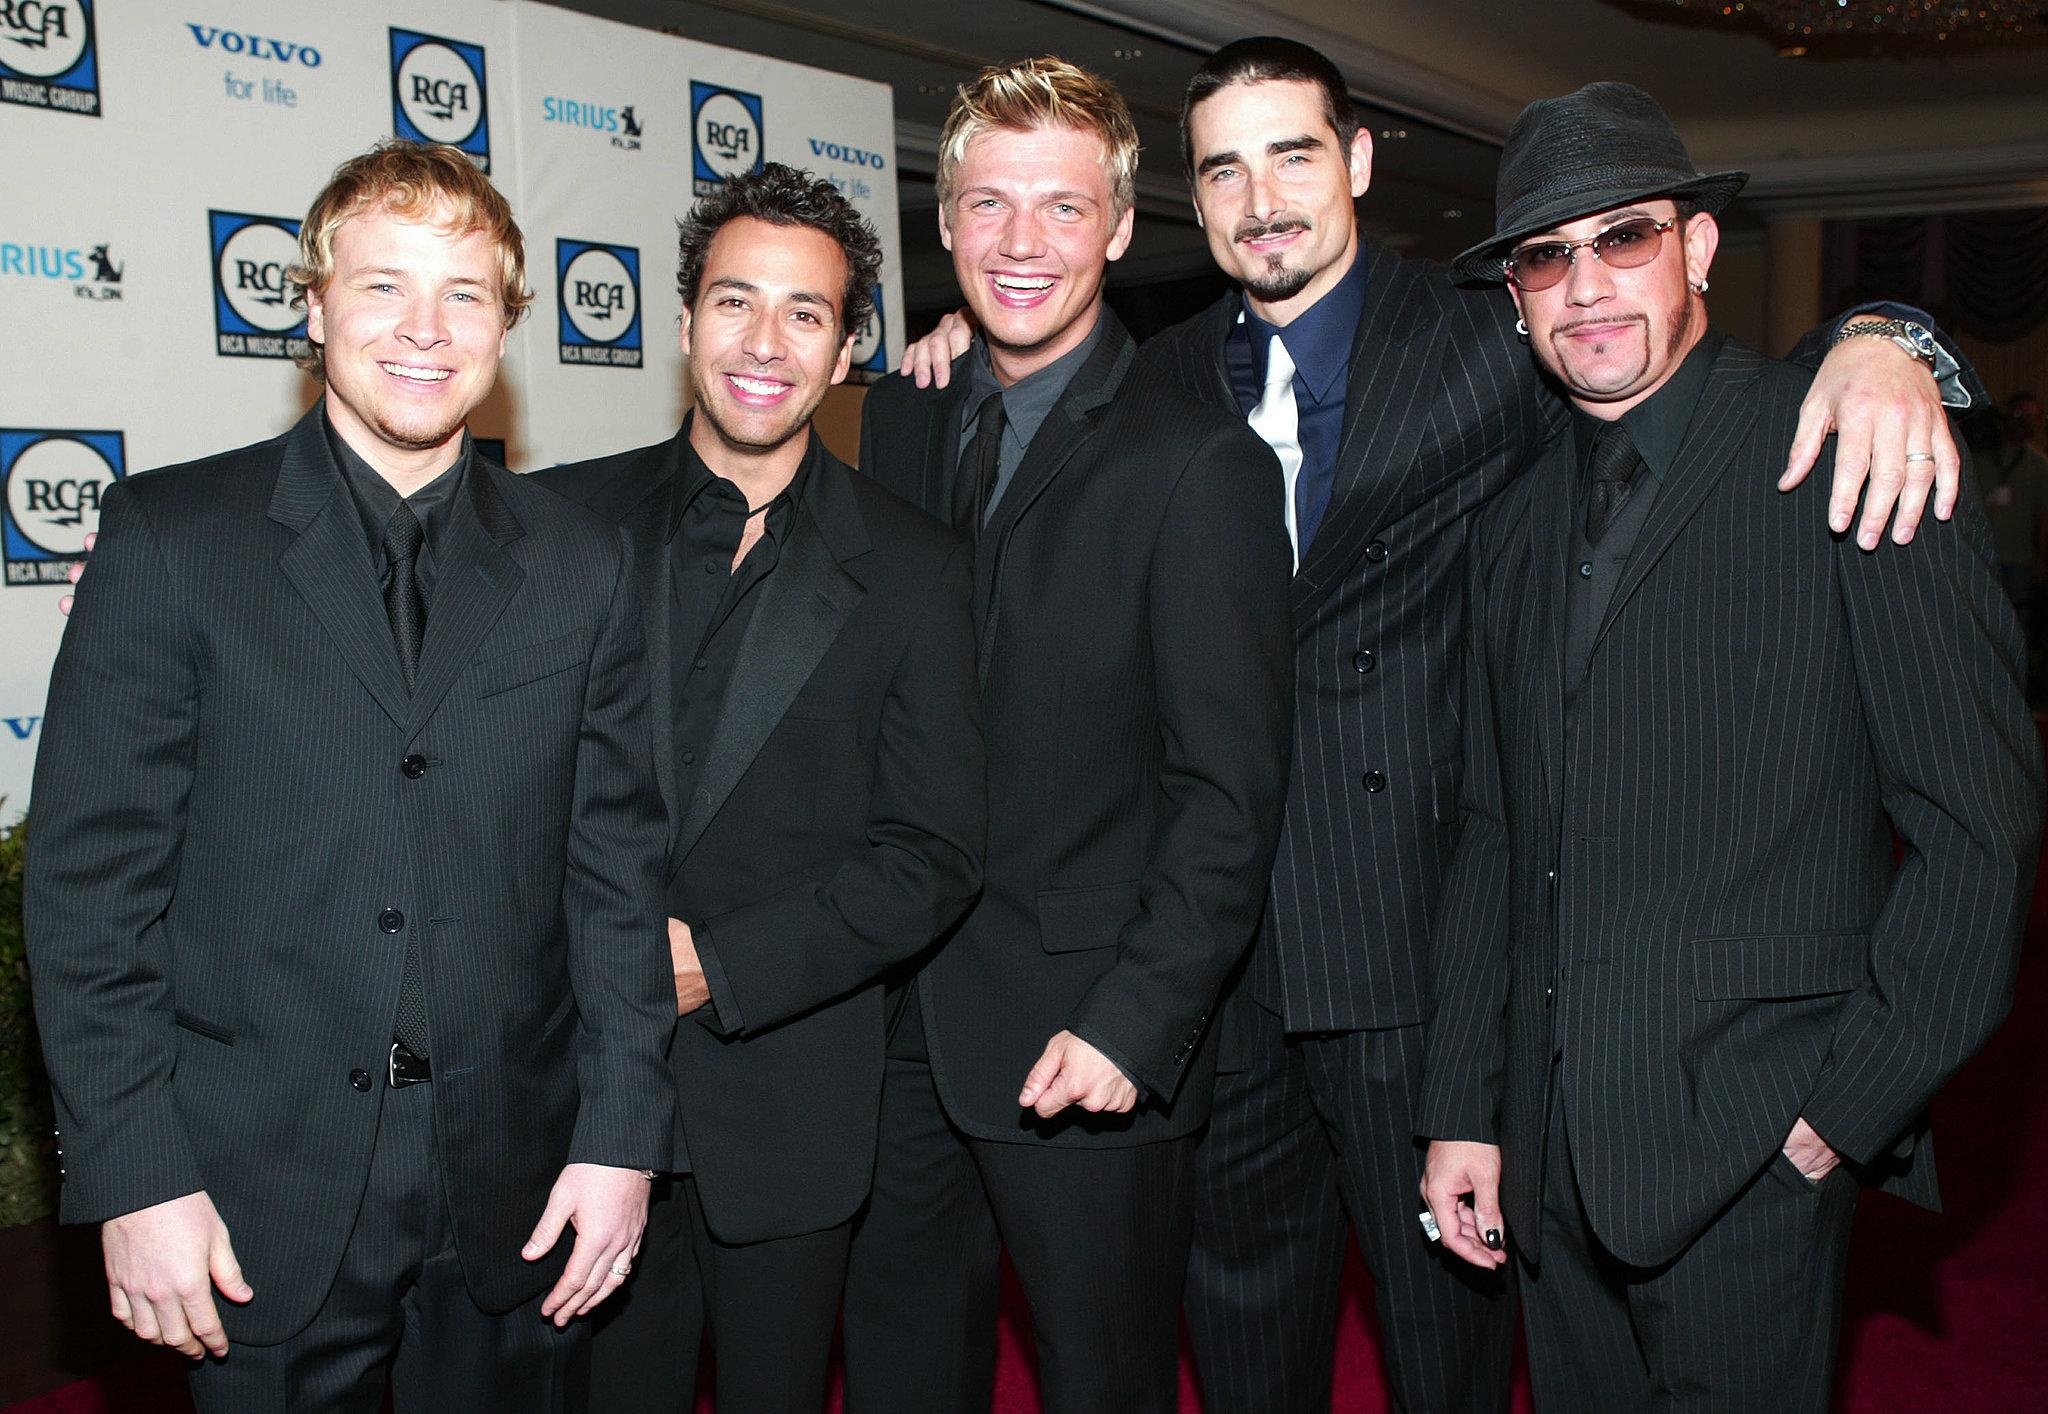 Ta-da! It's Backstreet Boys concert perfection.